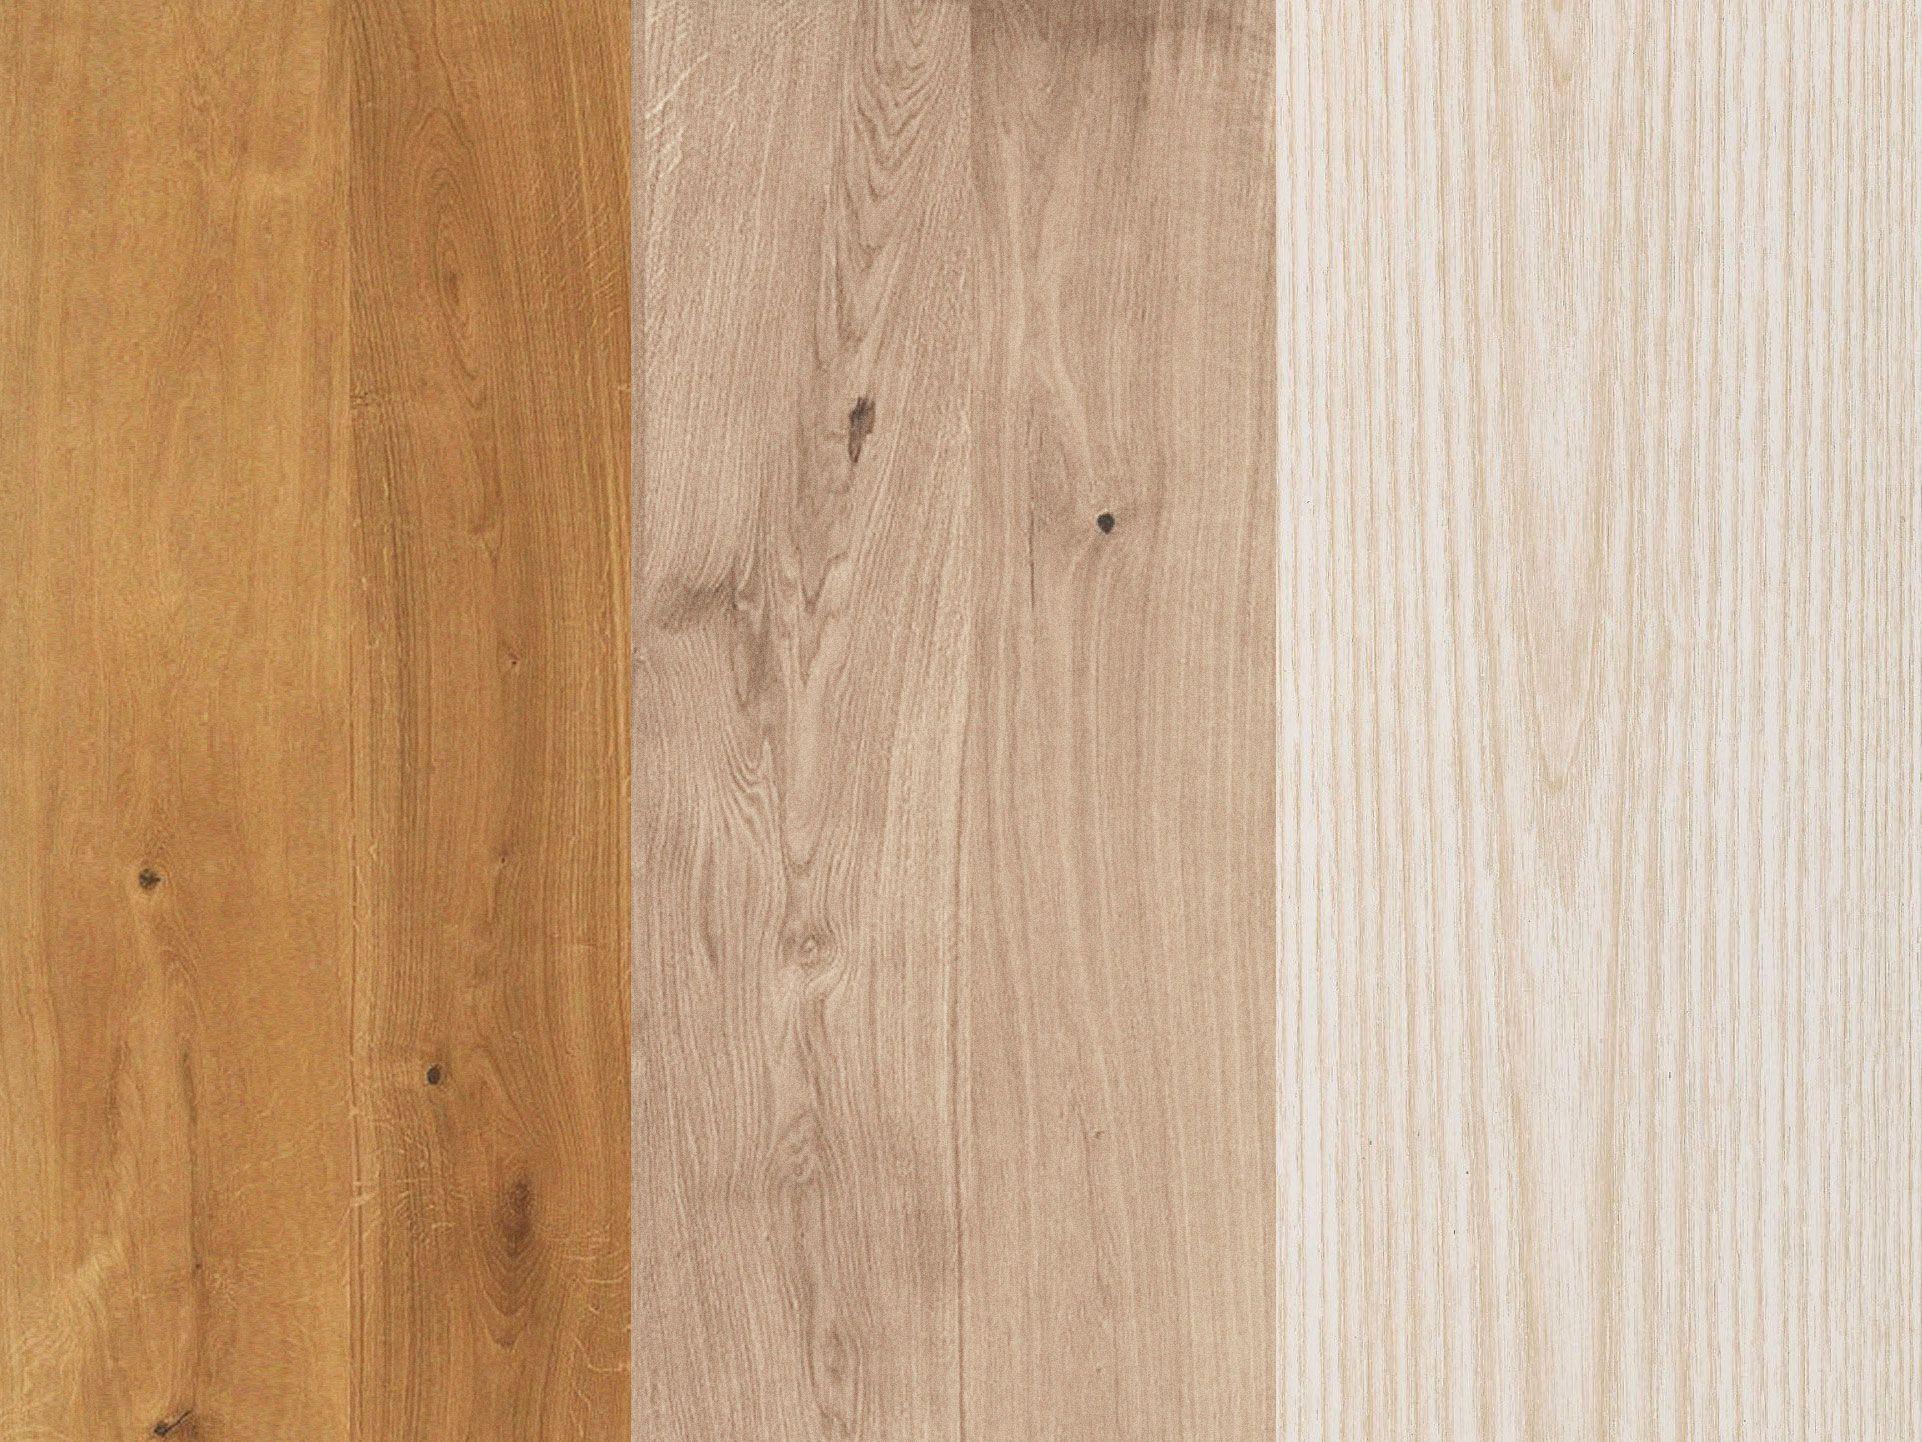 Glein Wien Samples Of Oiled Oak Wood White Oak Wood Ash Wood